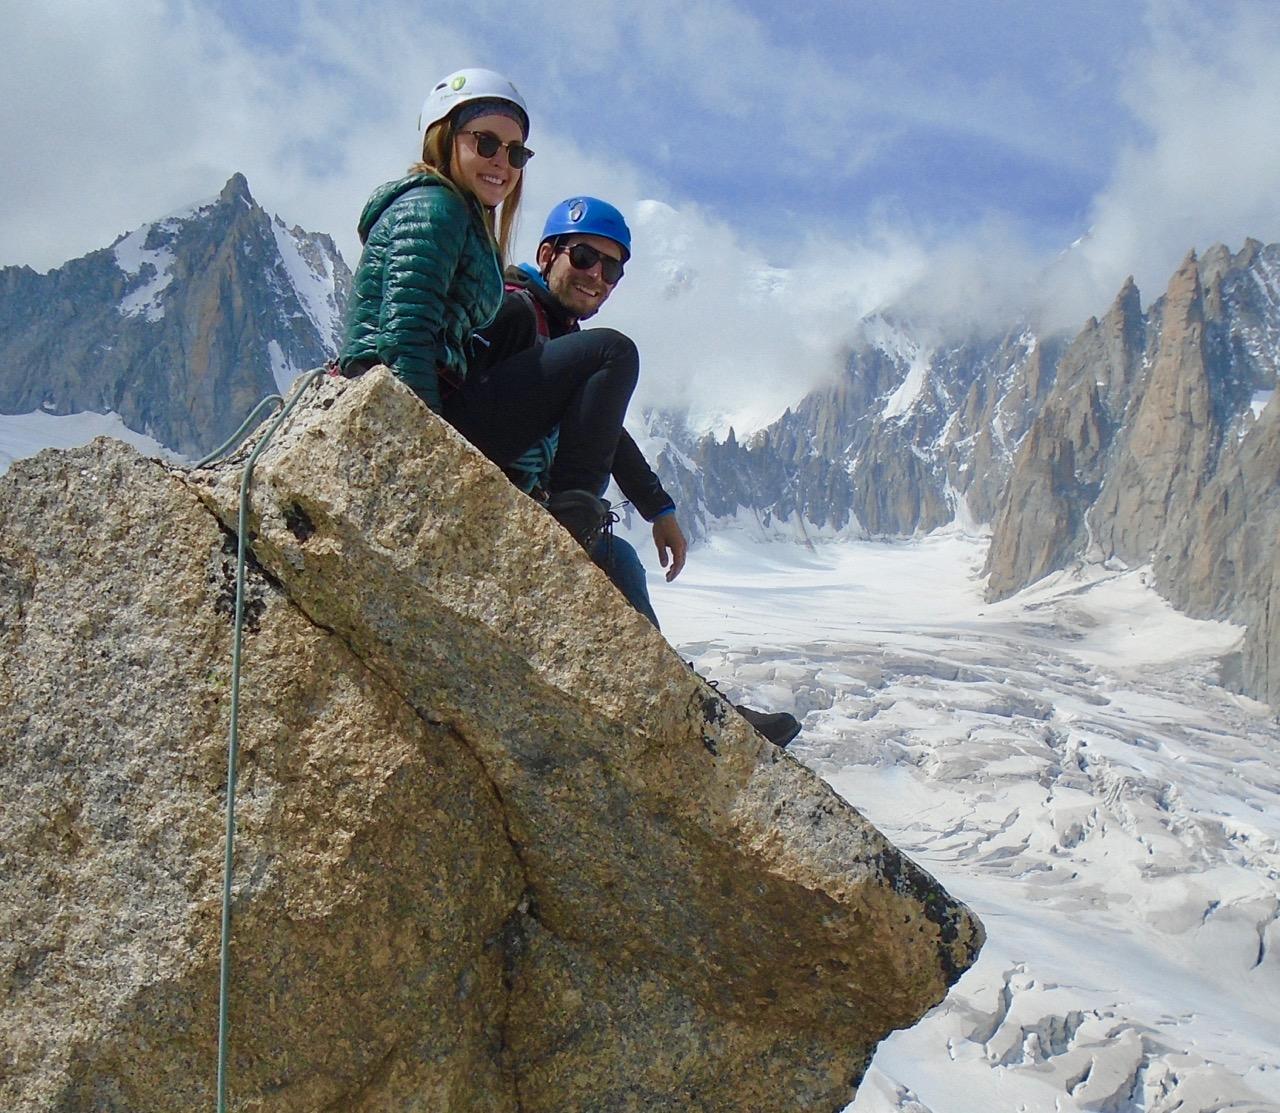 Chamonix Mountaineering & Weissmies, August 2017